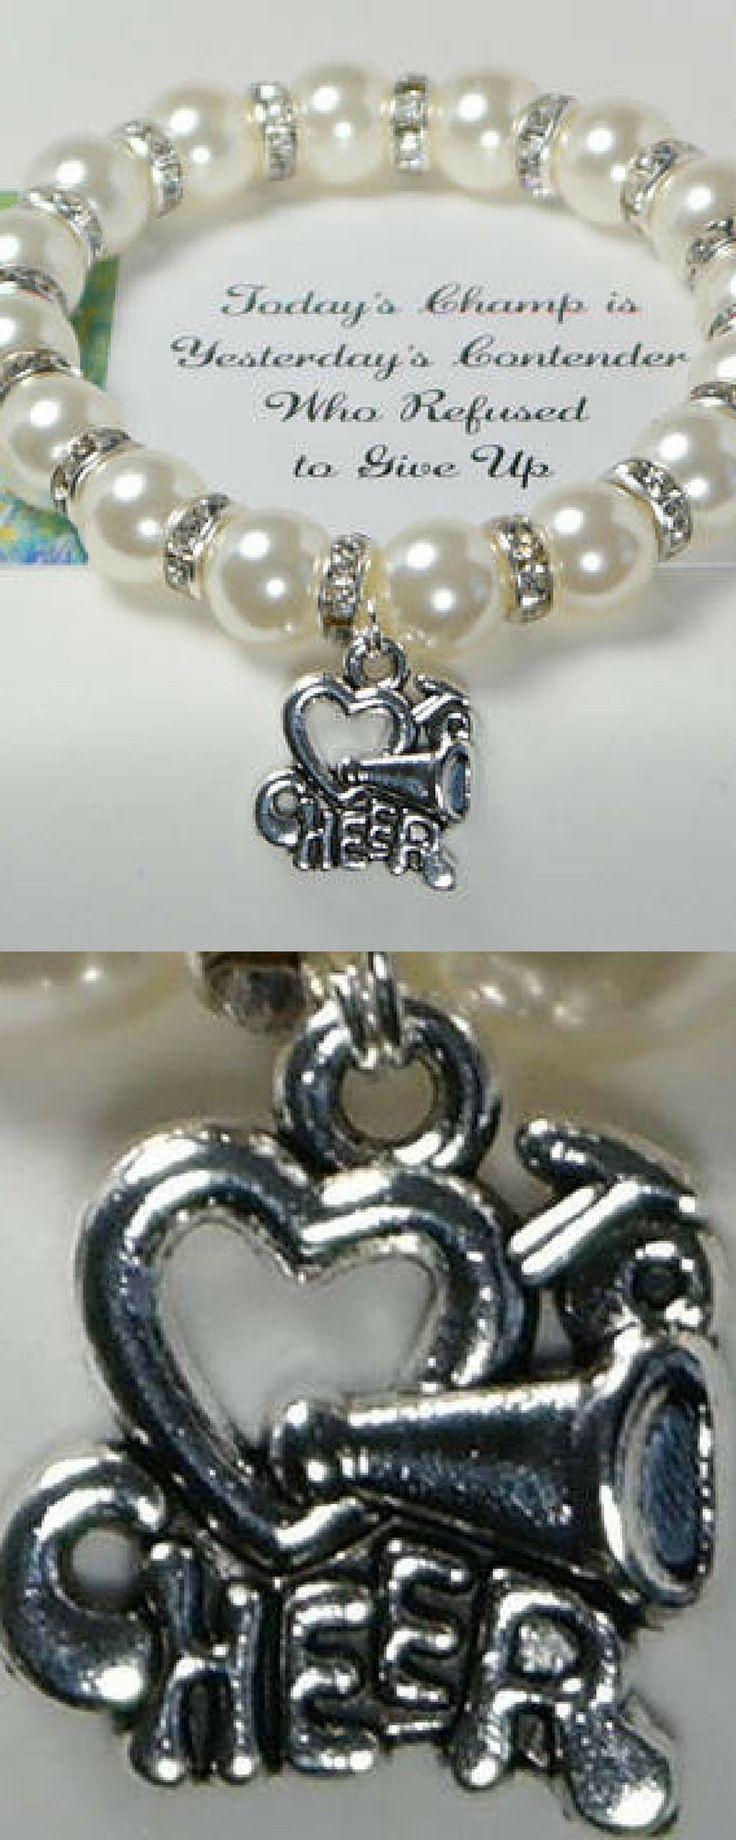 $6.99. cheerleader gift - cheer bracelet - faux pearls - pom poms - gift for cheer team - gift for cheer coach - cheerleading gift - cheer gift - cheer mom gift - cheer bow #cheerleading #ad